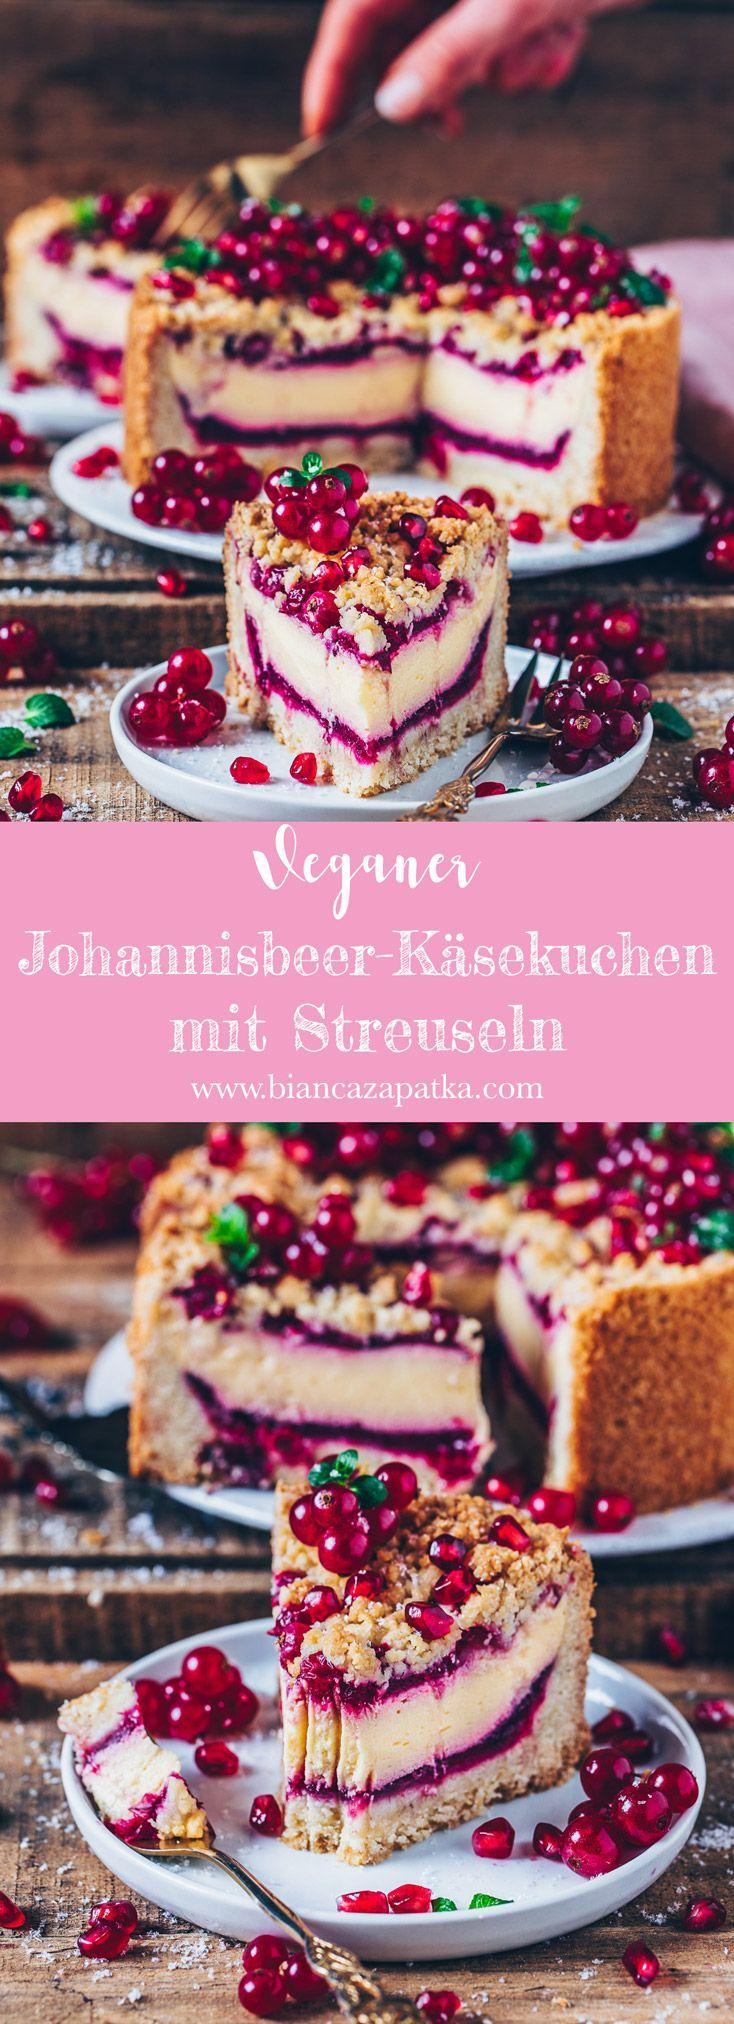 Johannisbeer-Käsekuchen mit Streuseln (vegan) - Bianca Zapatka | Rezepte #cheesecakes